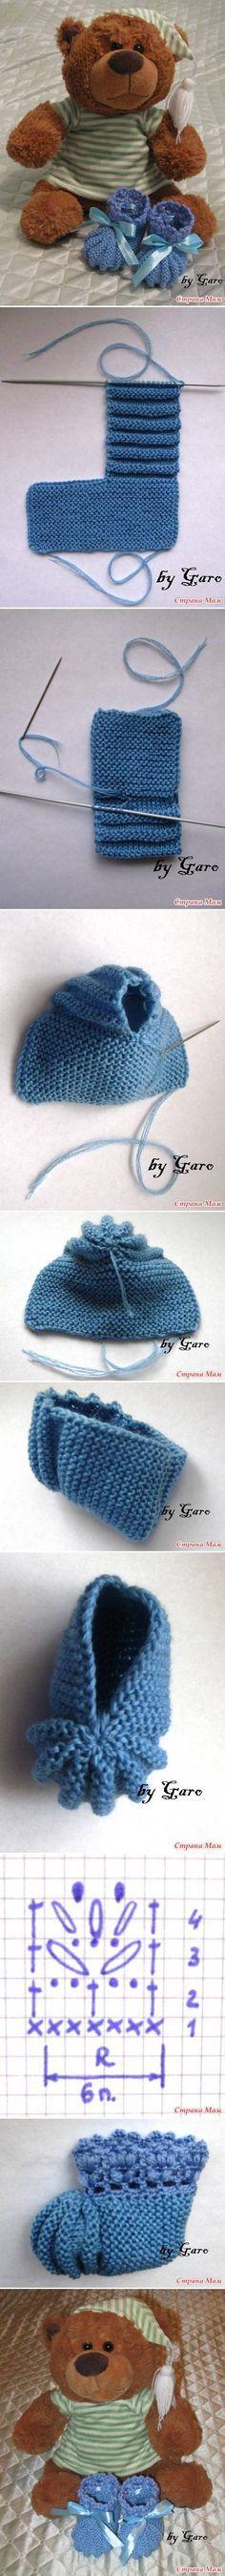 DIY No Sole Booties DIY Projects   UsefulDIY.com Follow Us on Facebook ==> http://www.facebook.com/UsefulDiy